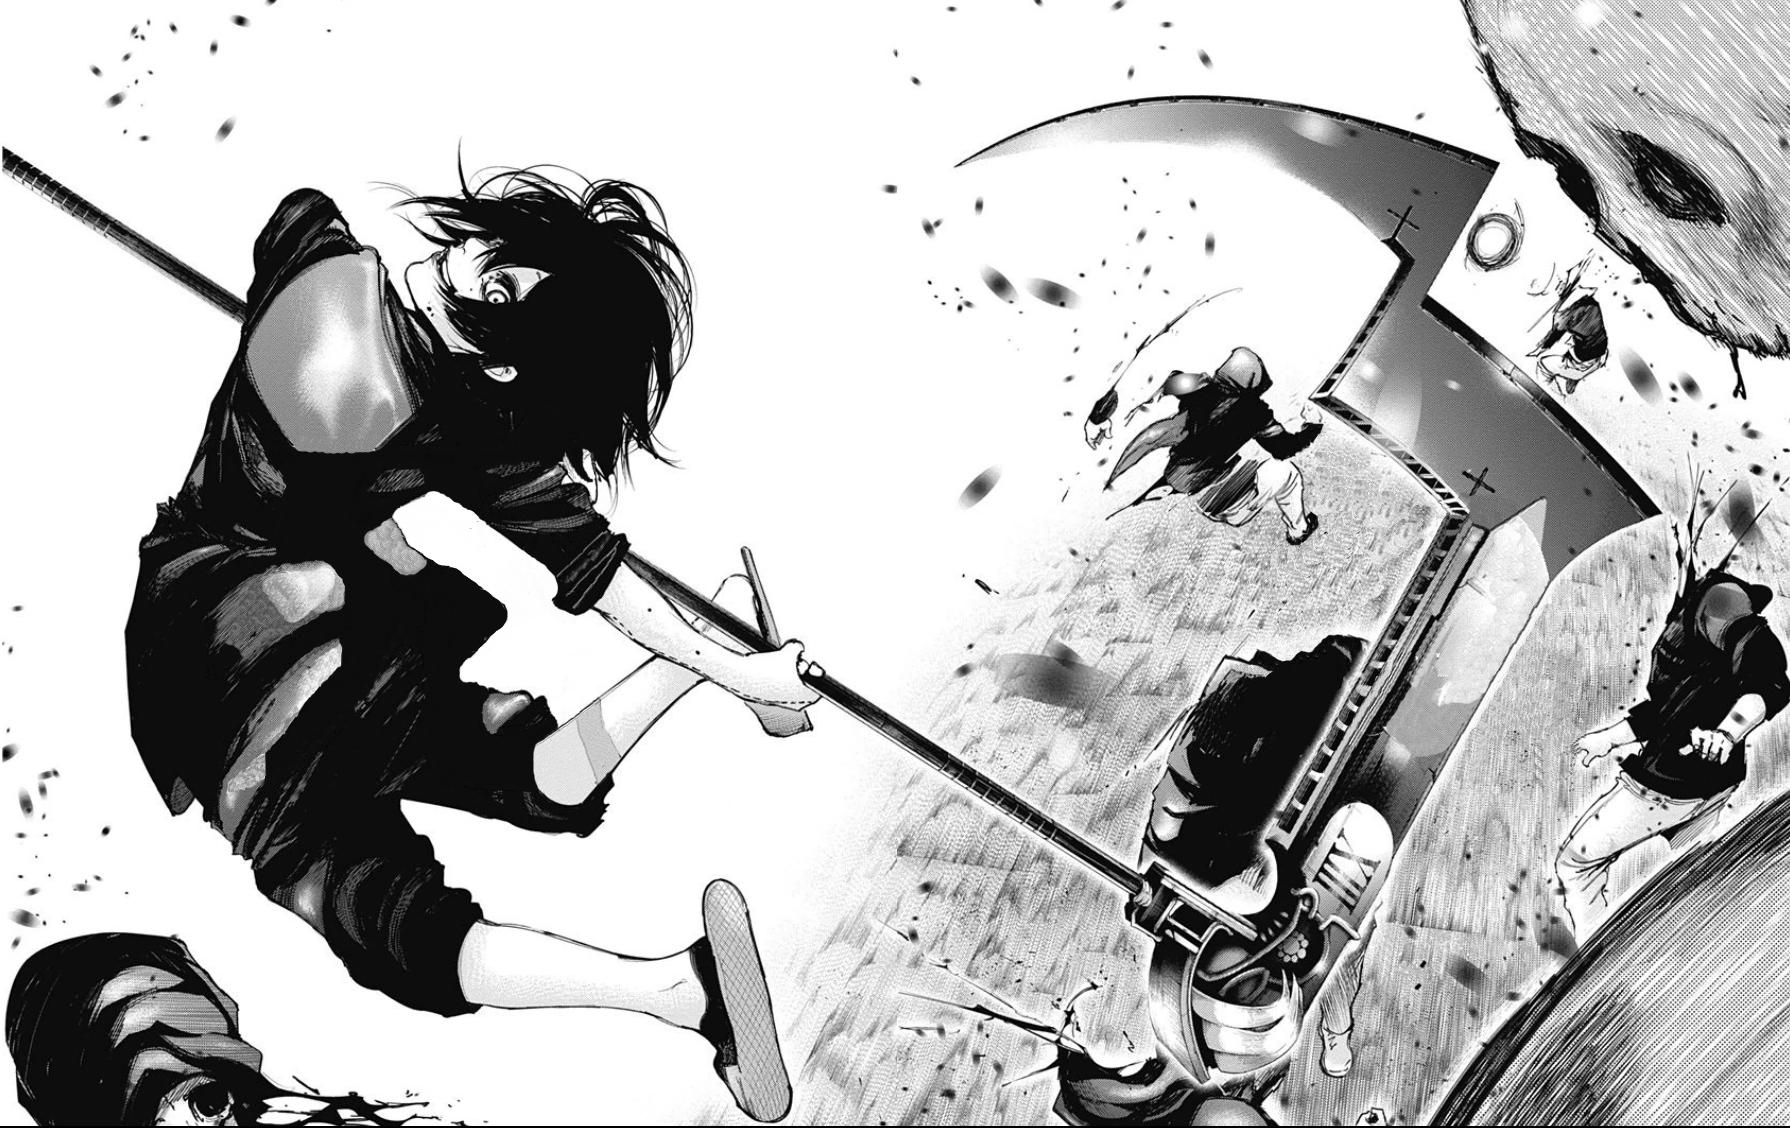 Favorite Fictional Weapons 13's_Jason_-_Joker